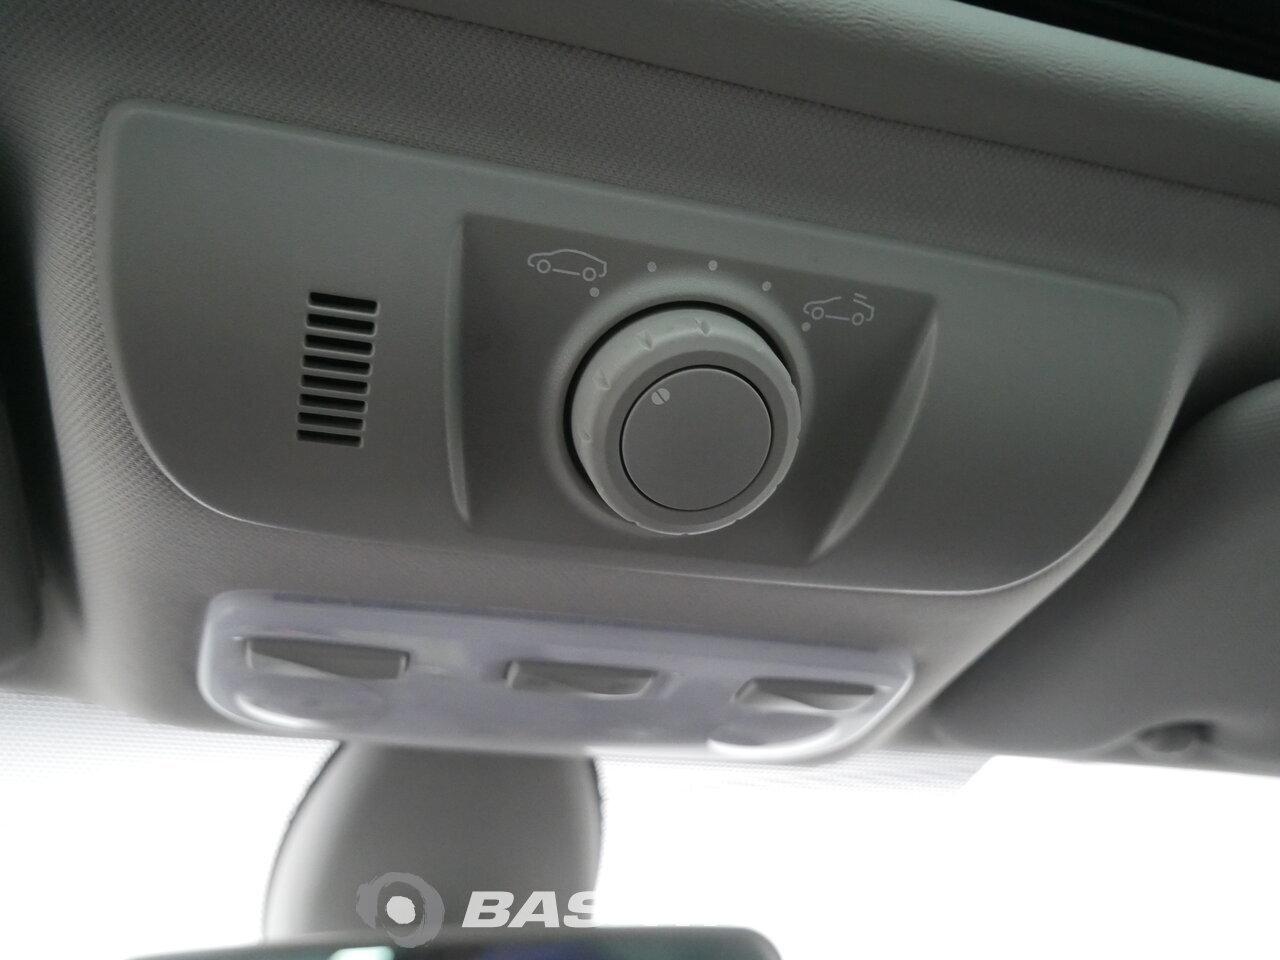 foto di Usato Macchina Renault Megane dCi 2012